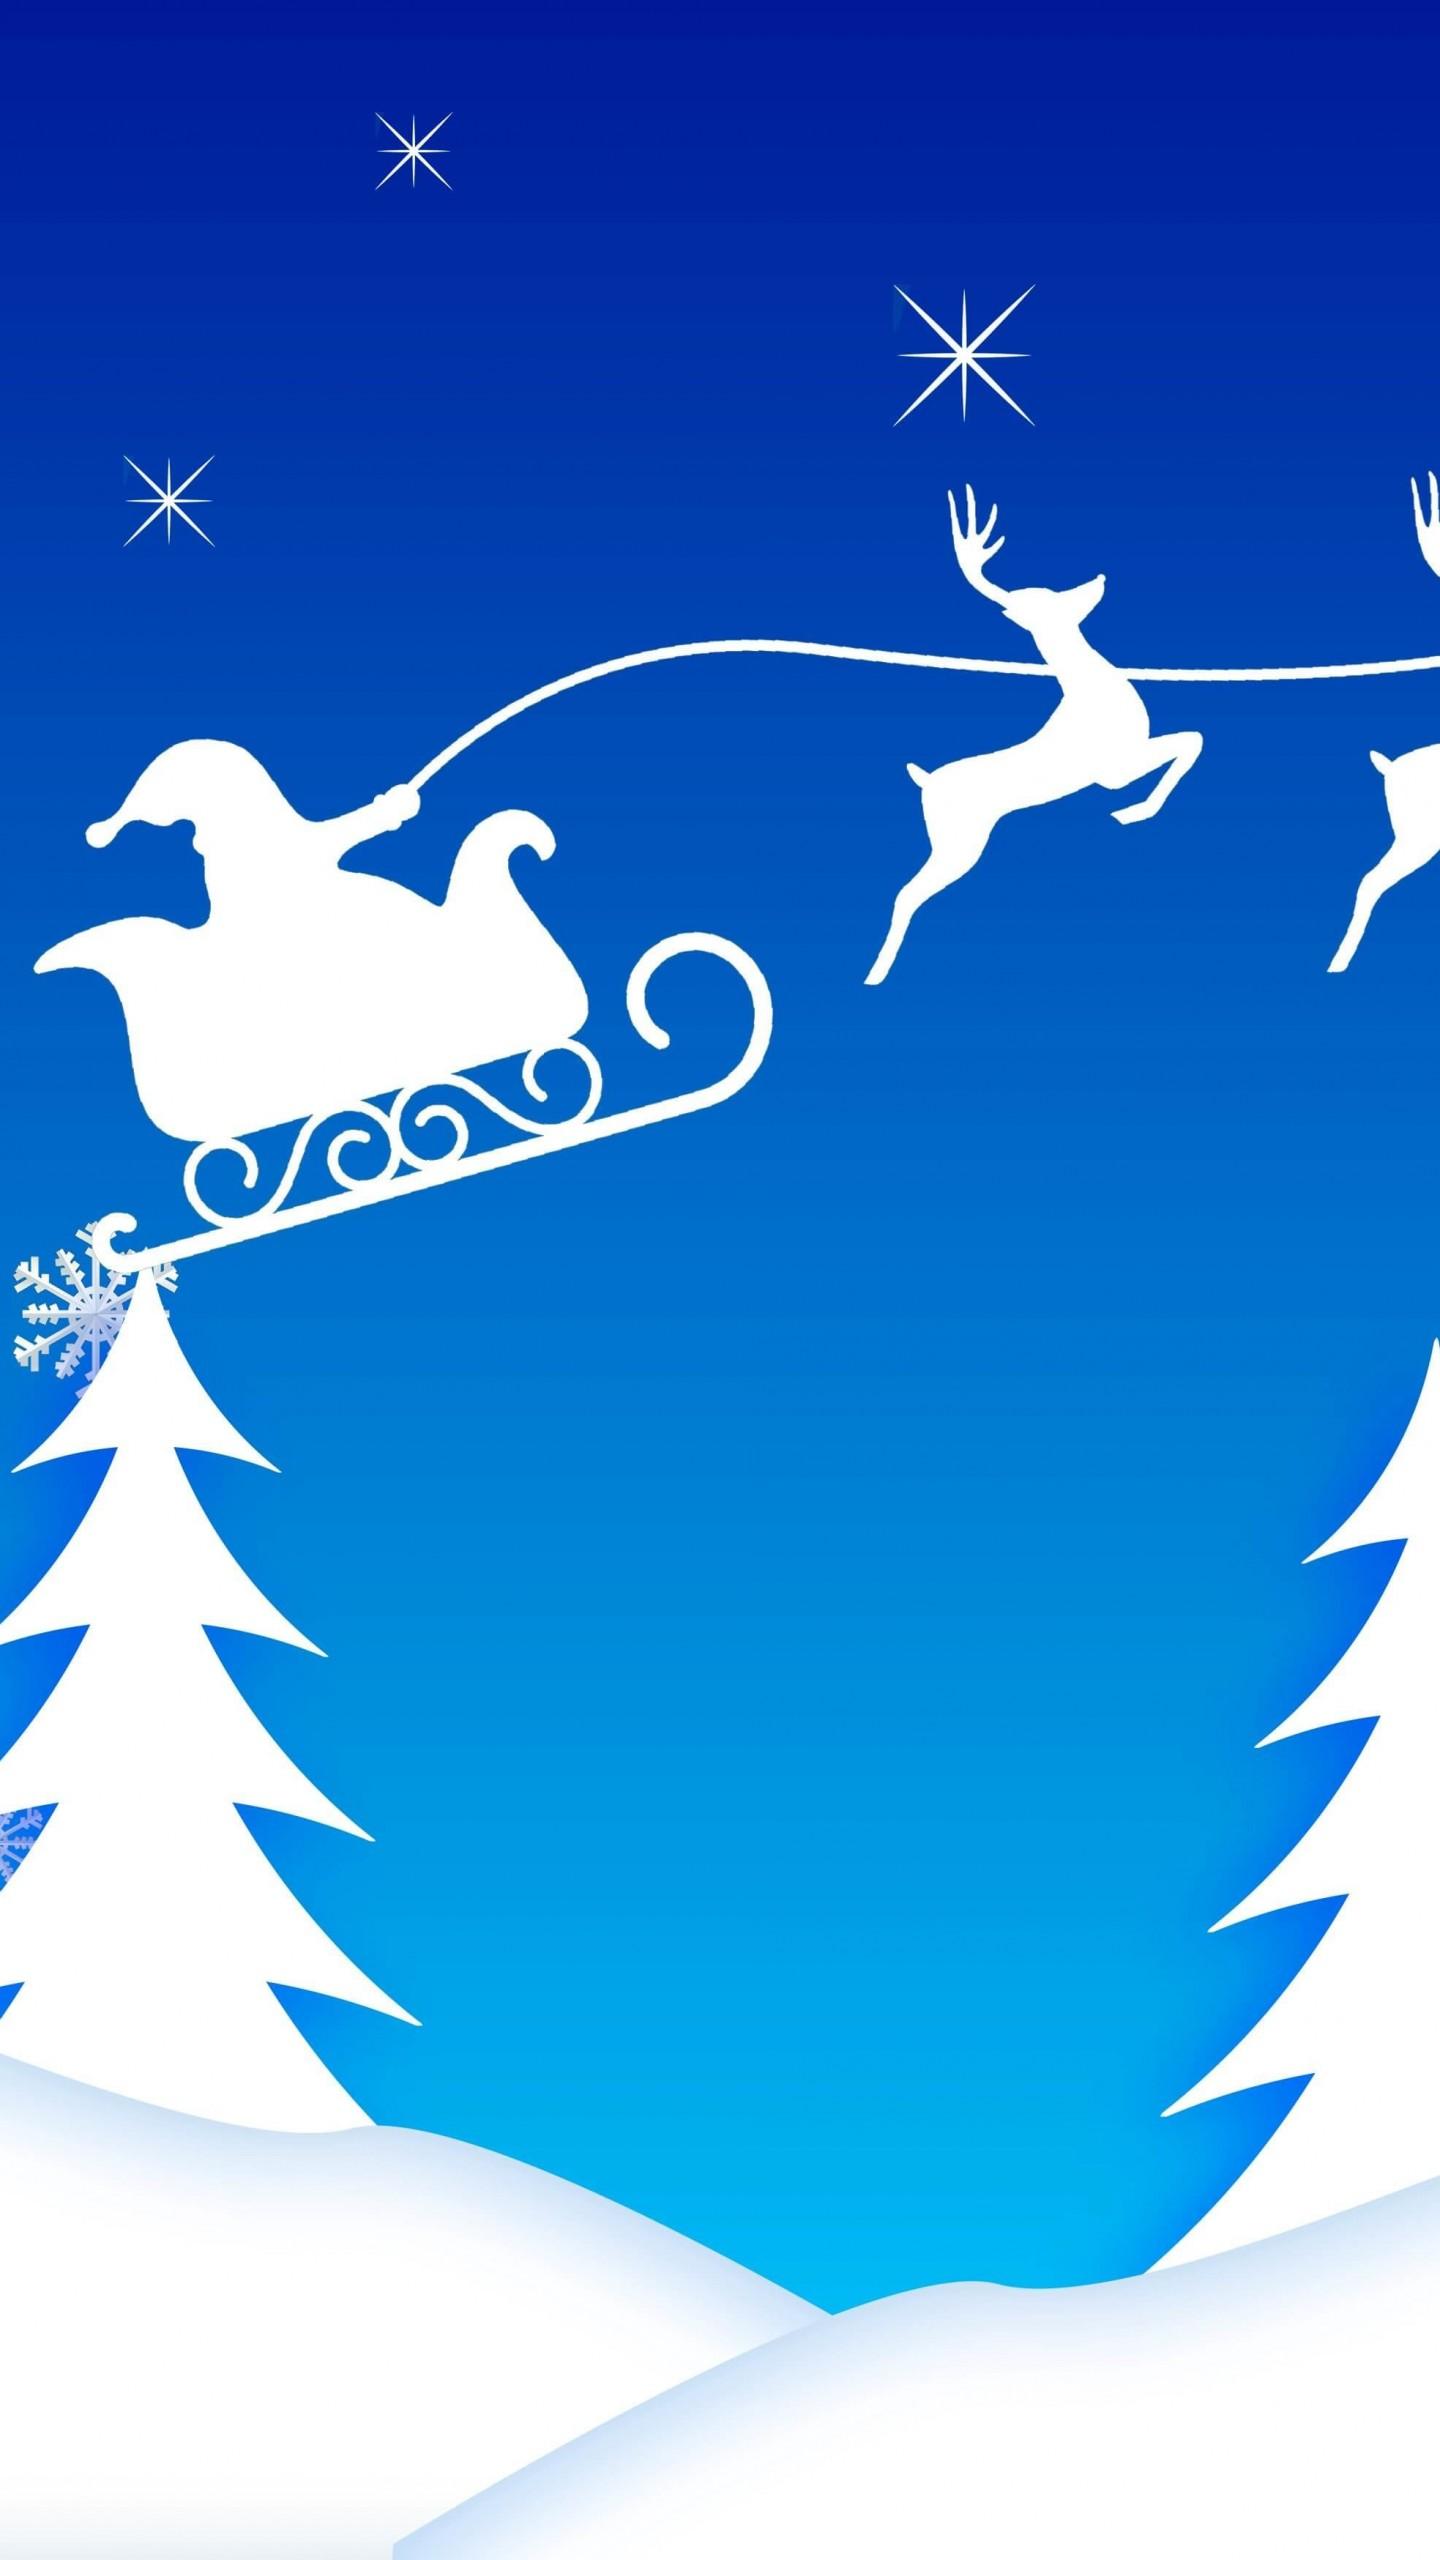 Download Santa S Sleigh Illustration Hd Wallpaper For